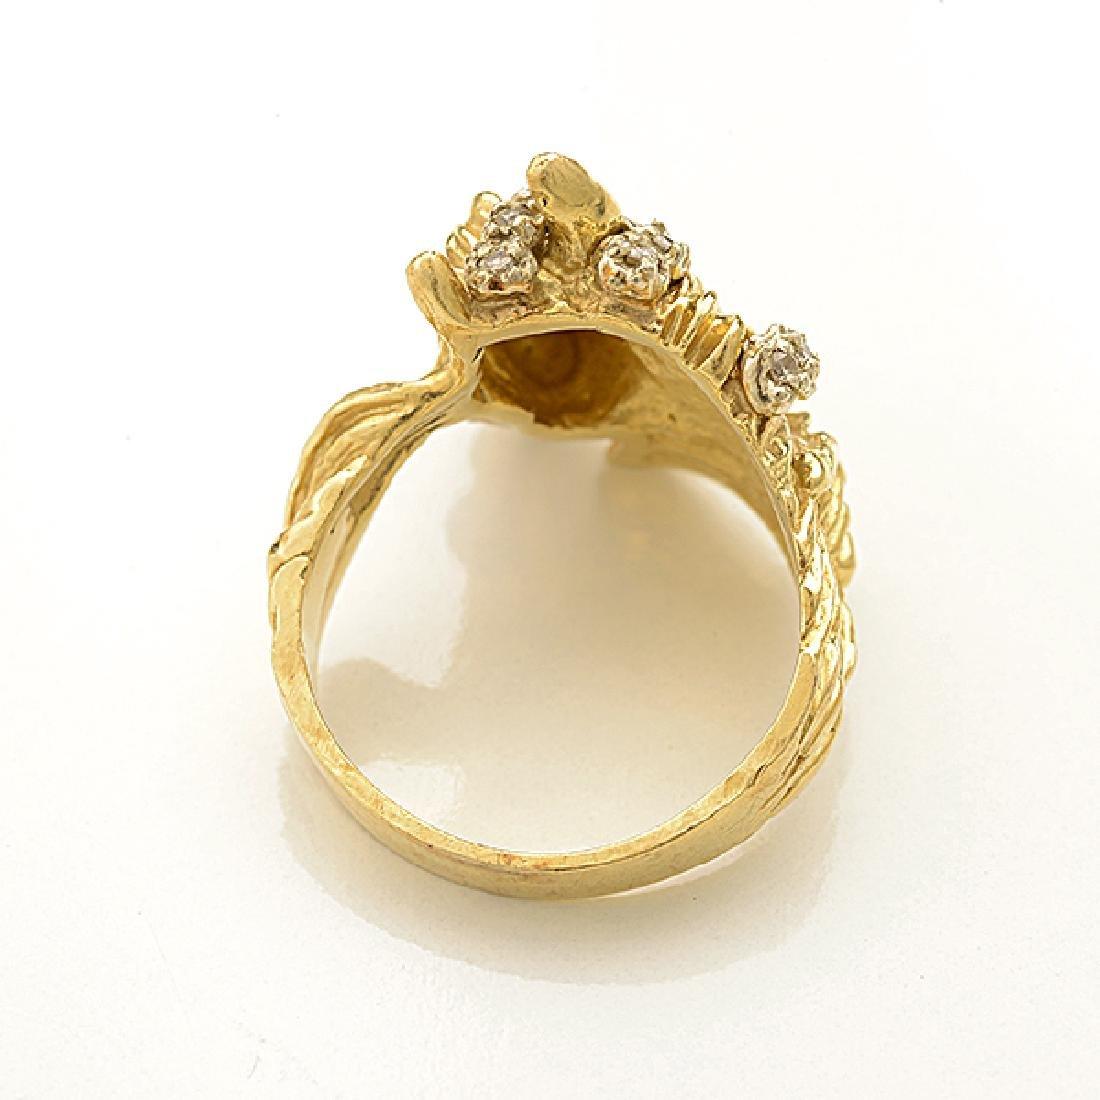 Diamond, 14k Yellow Gold Horse Ring. - 3